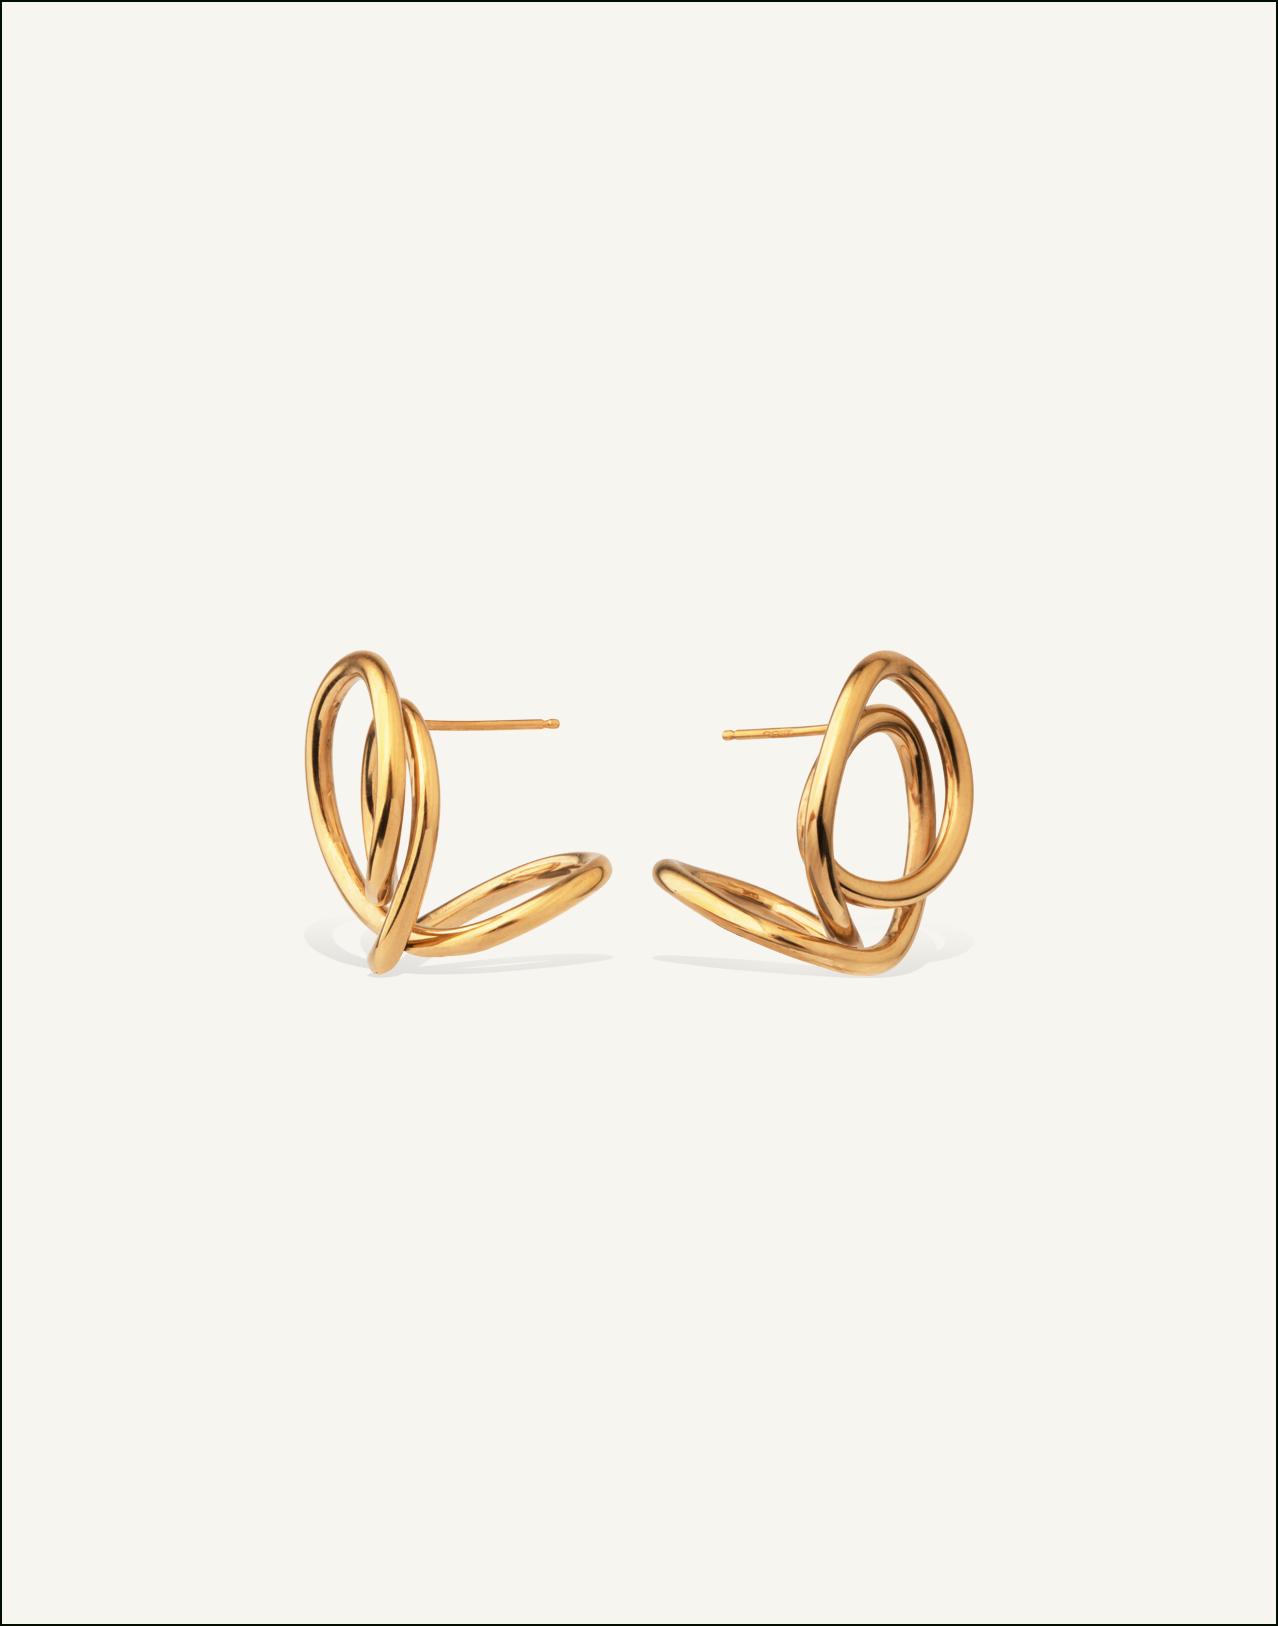 Completedworks-Earrings-The-Philosopher-2-1.jpg